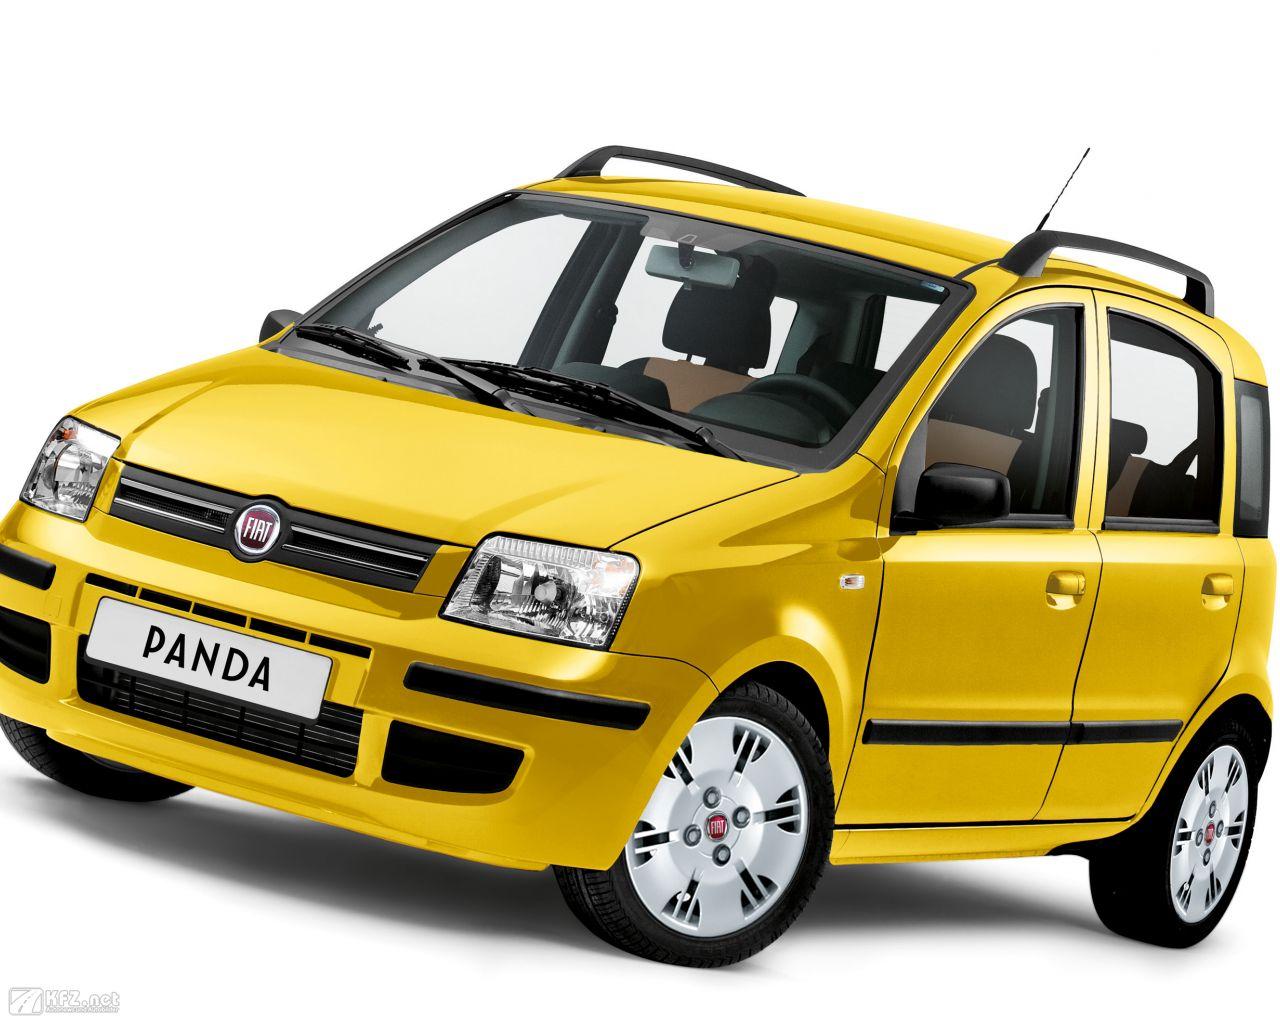 fiat-panda-1280x1024-1